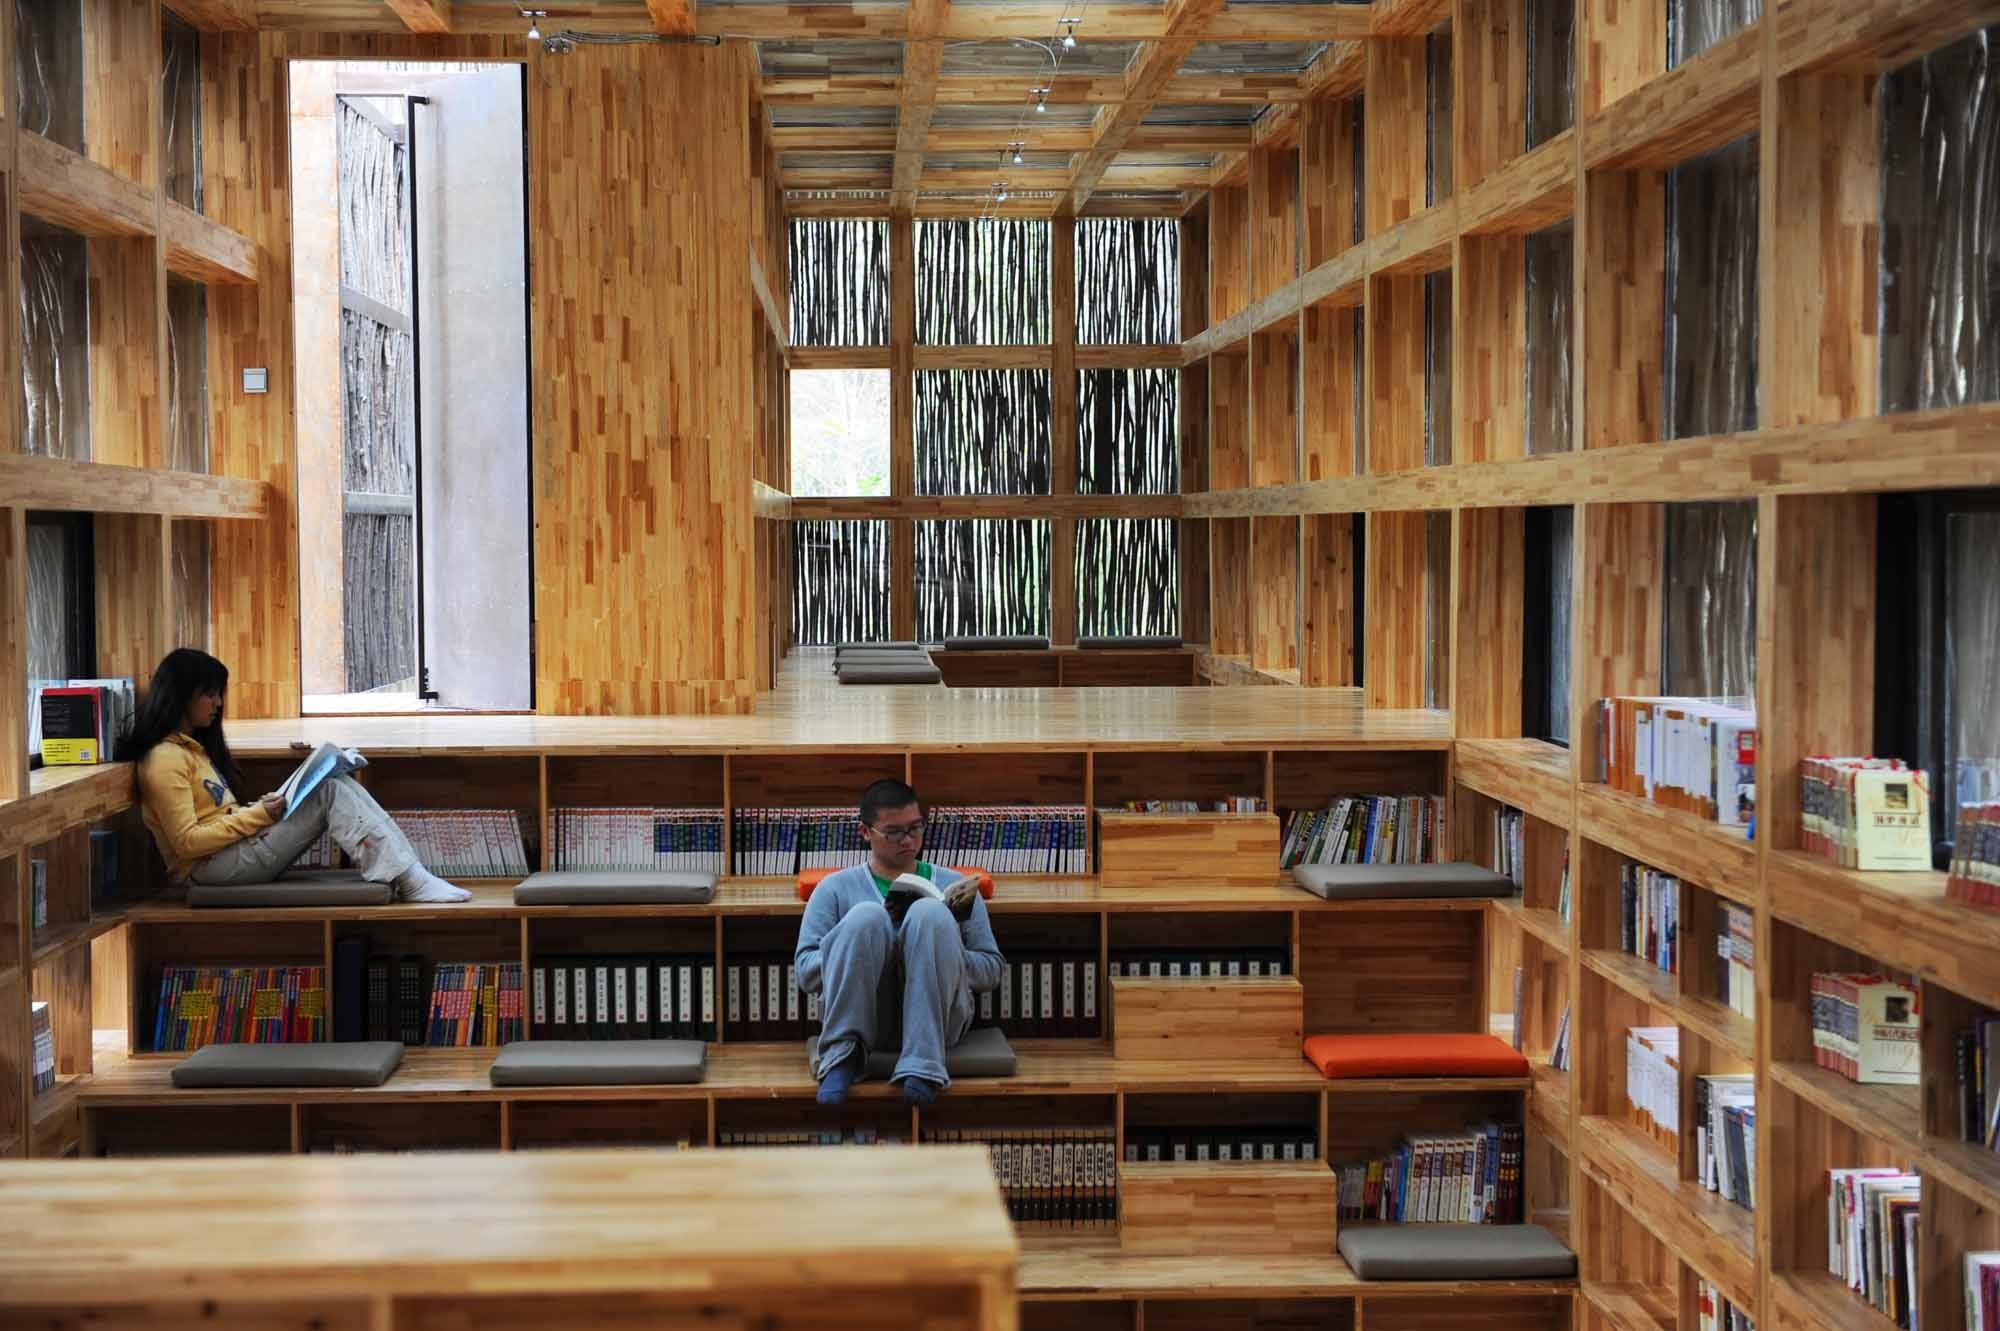 Li yuan bibliothek in jiaojiehe gesund bauen kultur for Innenraum designer programm